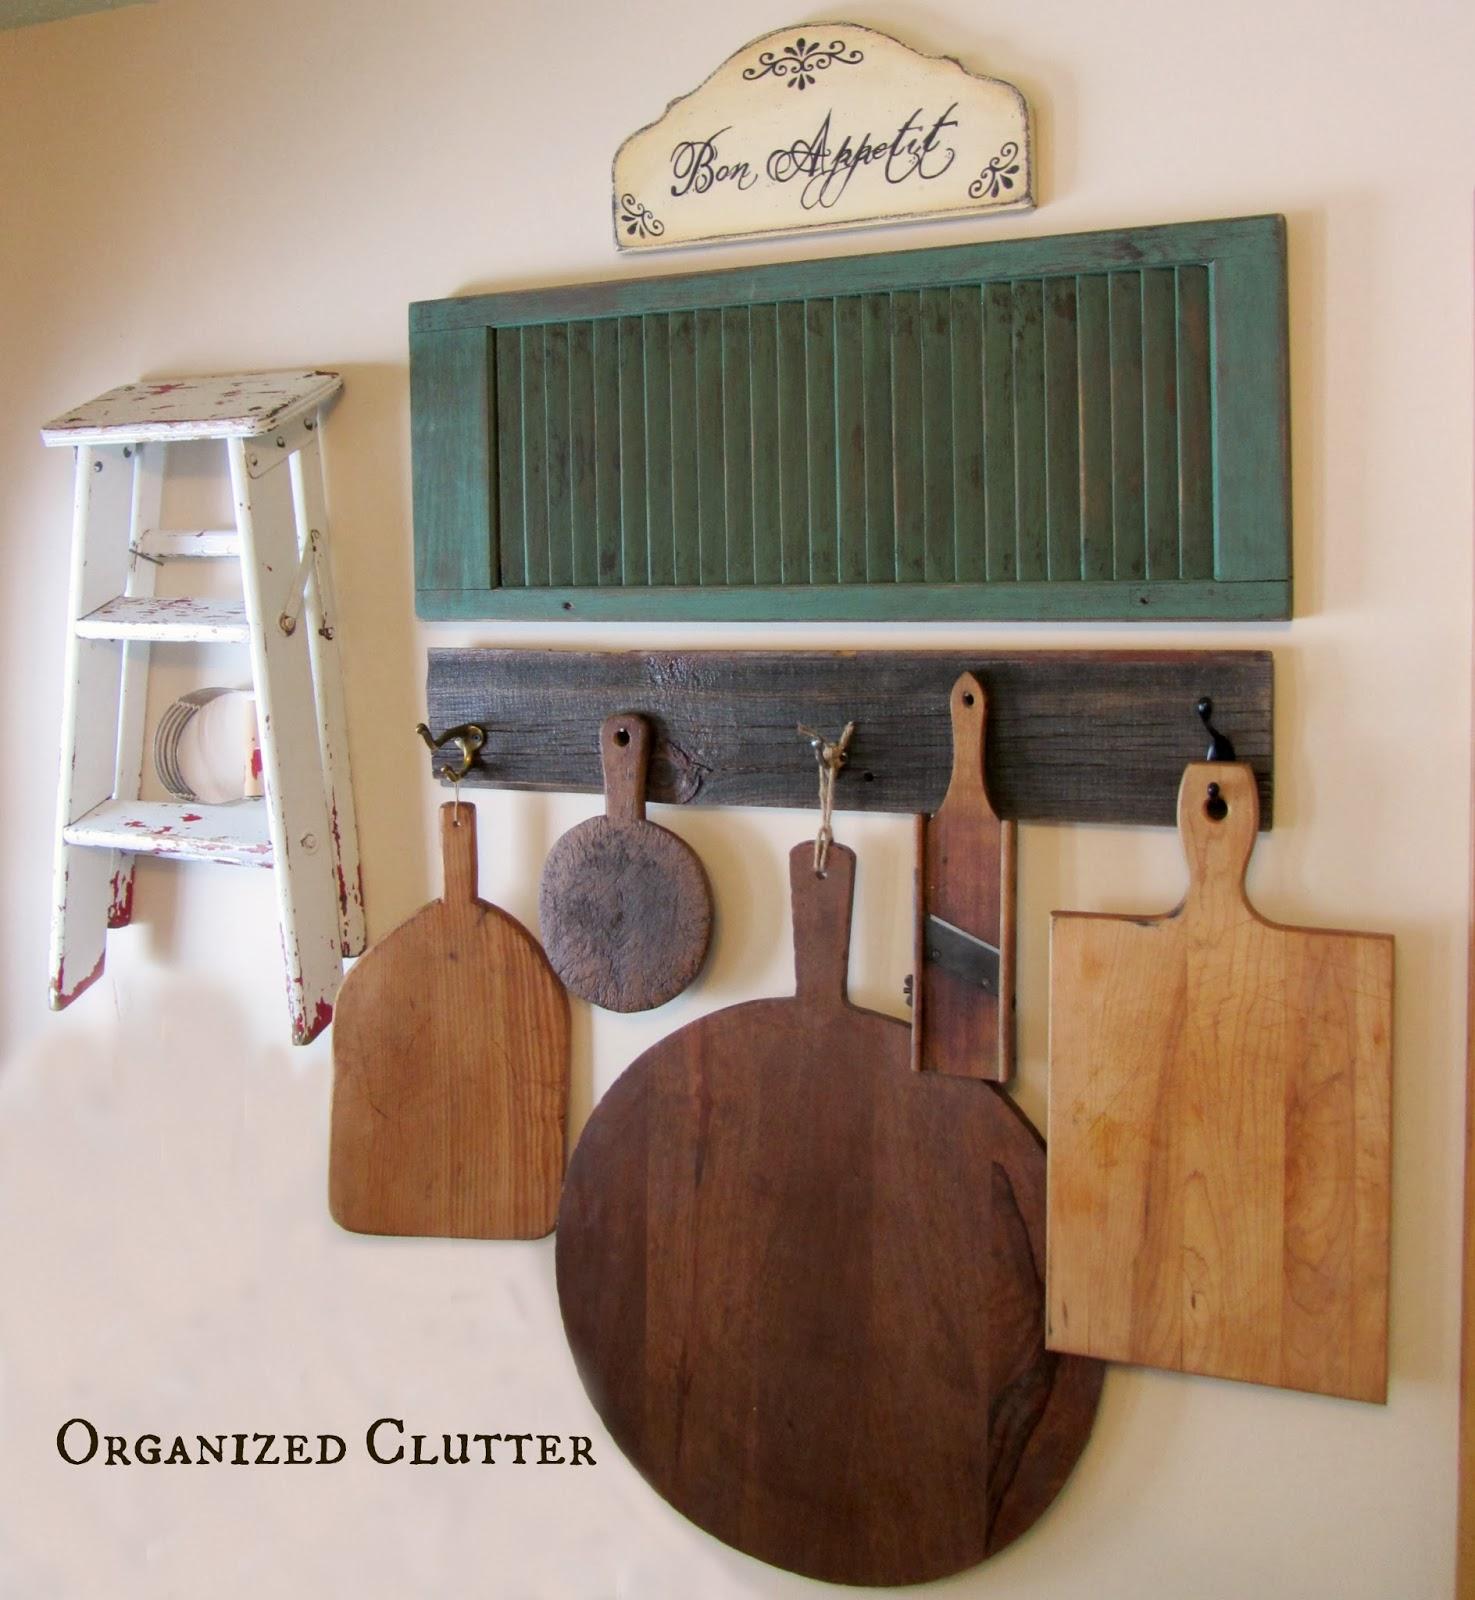 Farmhouse Kitchen Decor Www Organizedclutterqueen Blogspot Com